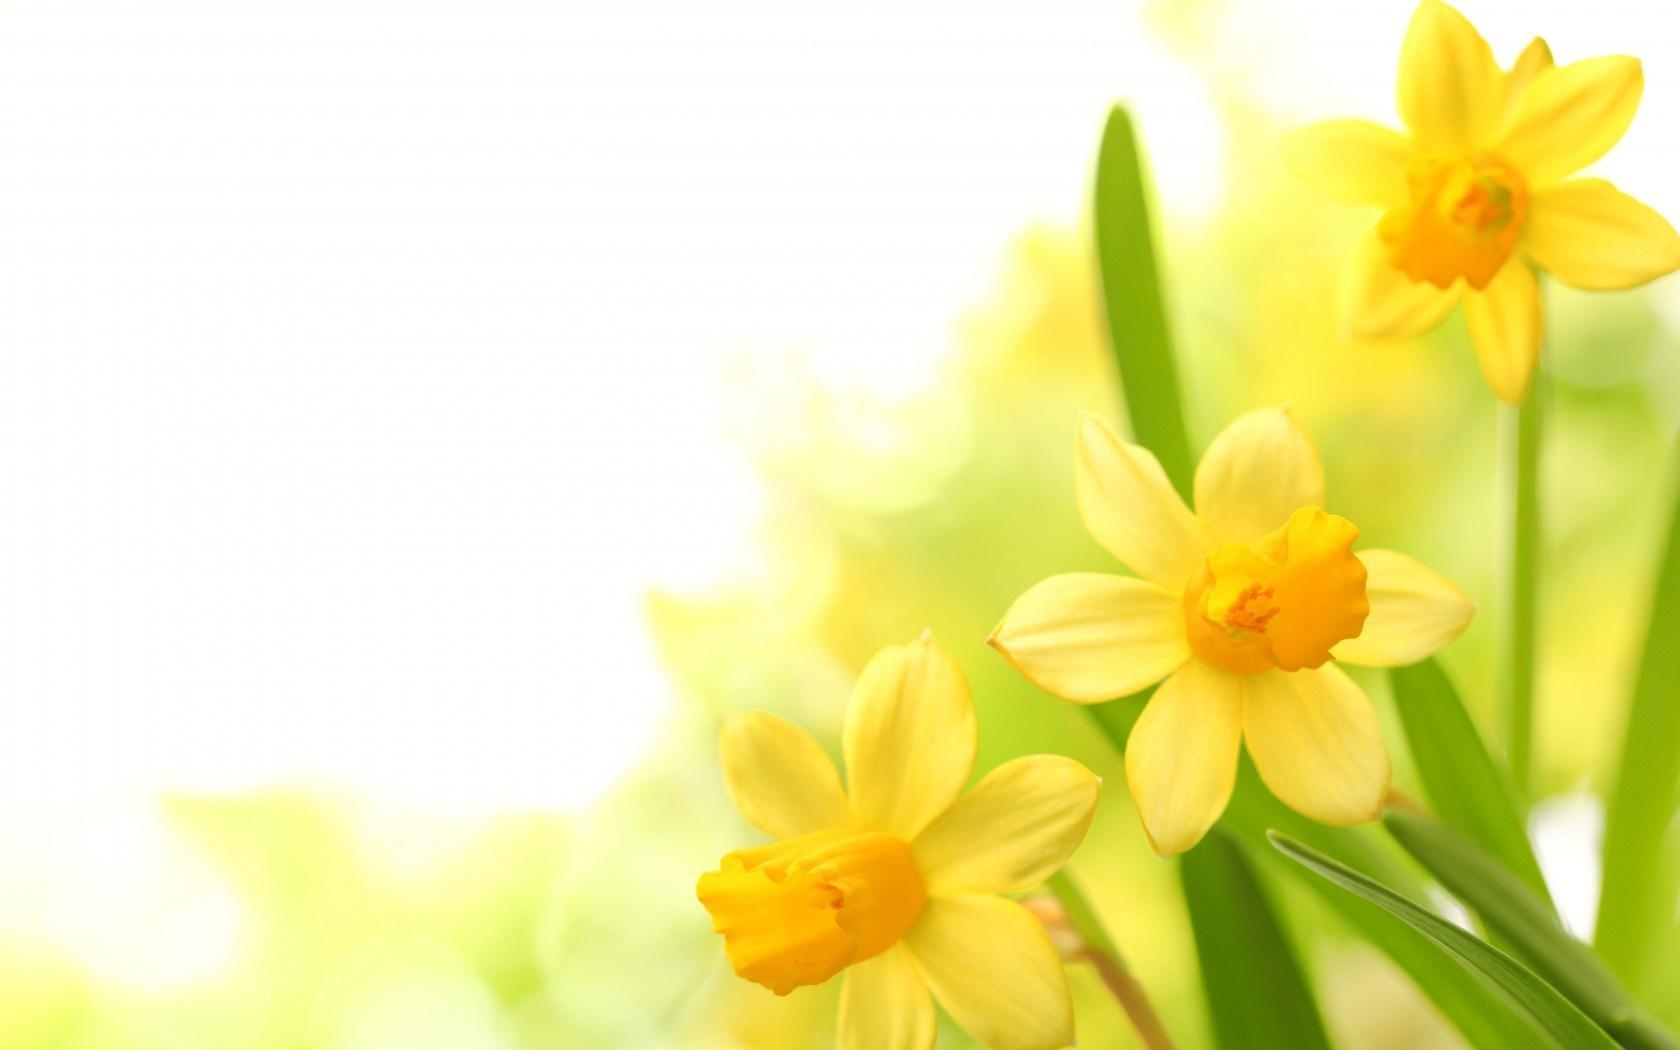 Flower Wallpaper For Iphone 1 High Resolution